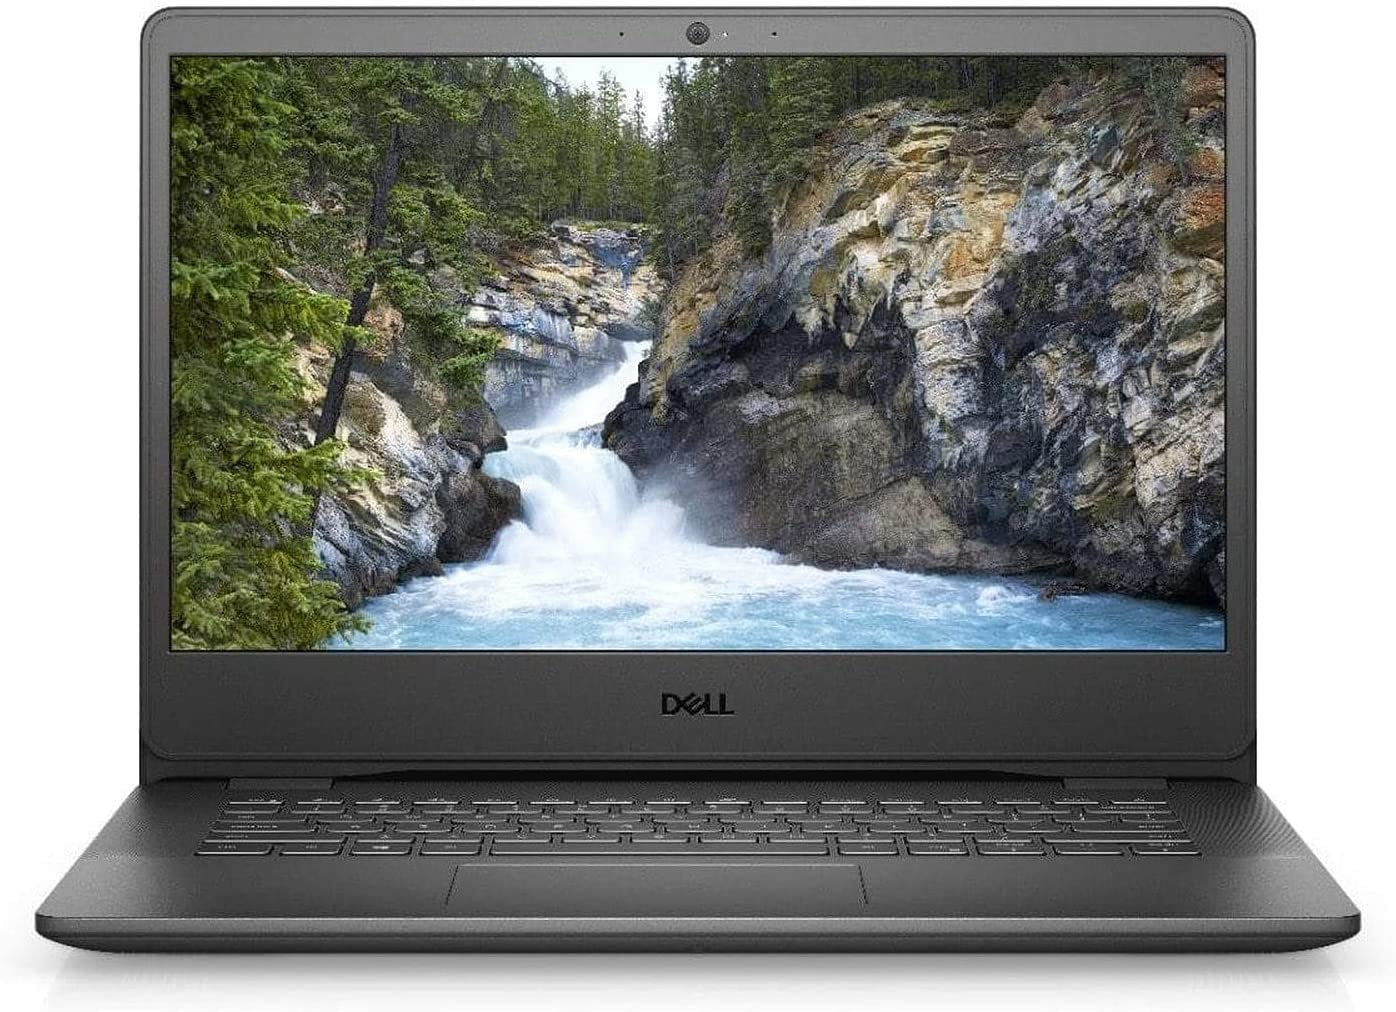 Dell Vostro 3400 Laptop 14 - Intel Core i3 11th Gen - i3-1115G4 - Dual Core 4.1Ghz - 1TB - 4GB RAM - 1366x768 HD - Windows 10 Pro